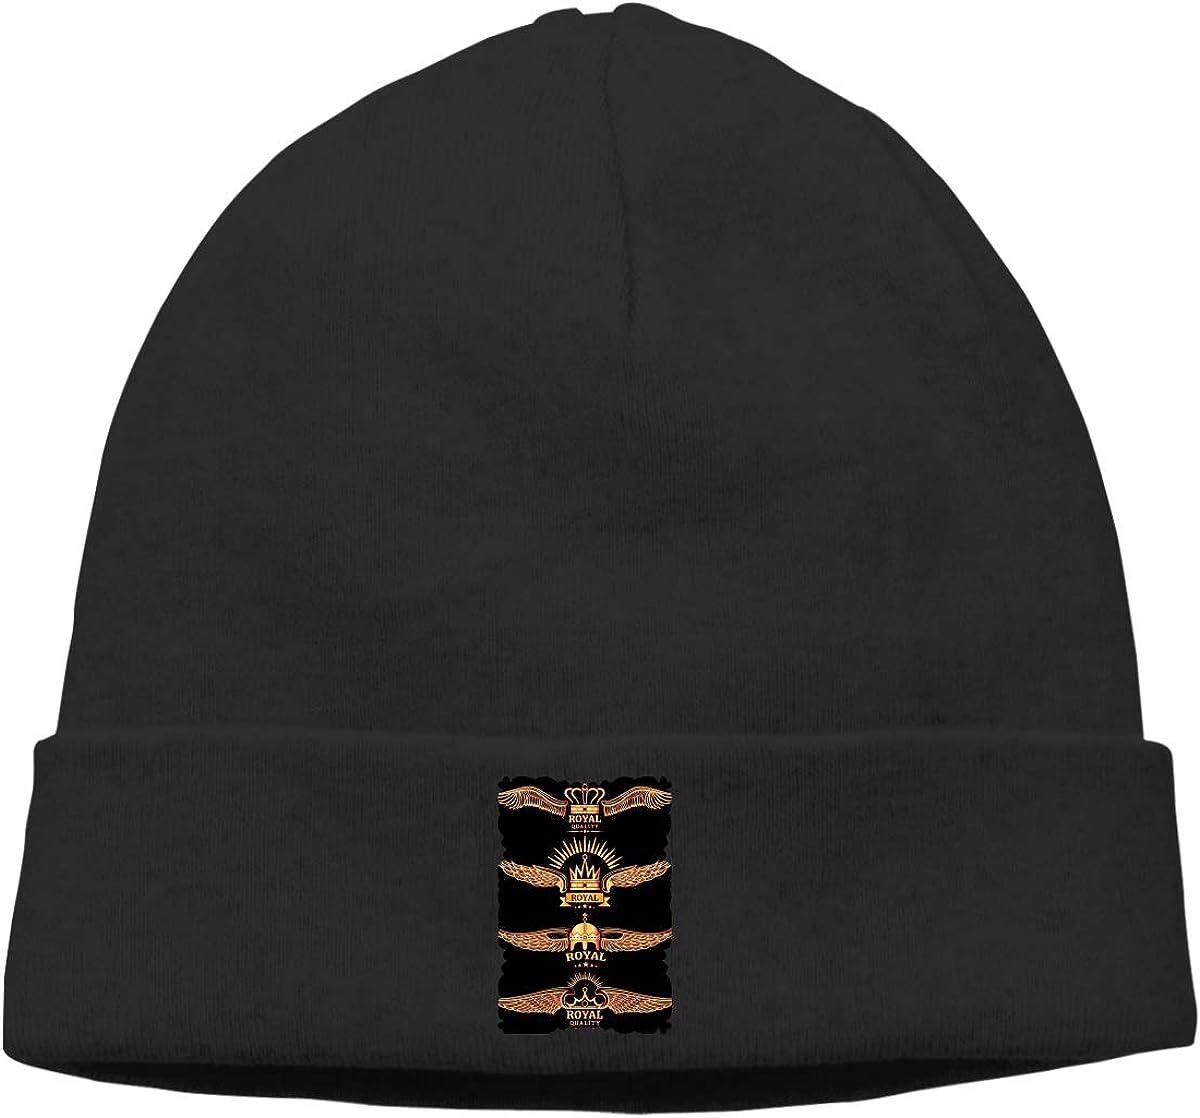 Sppeuio Crown Royal Cap Cool